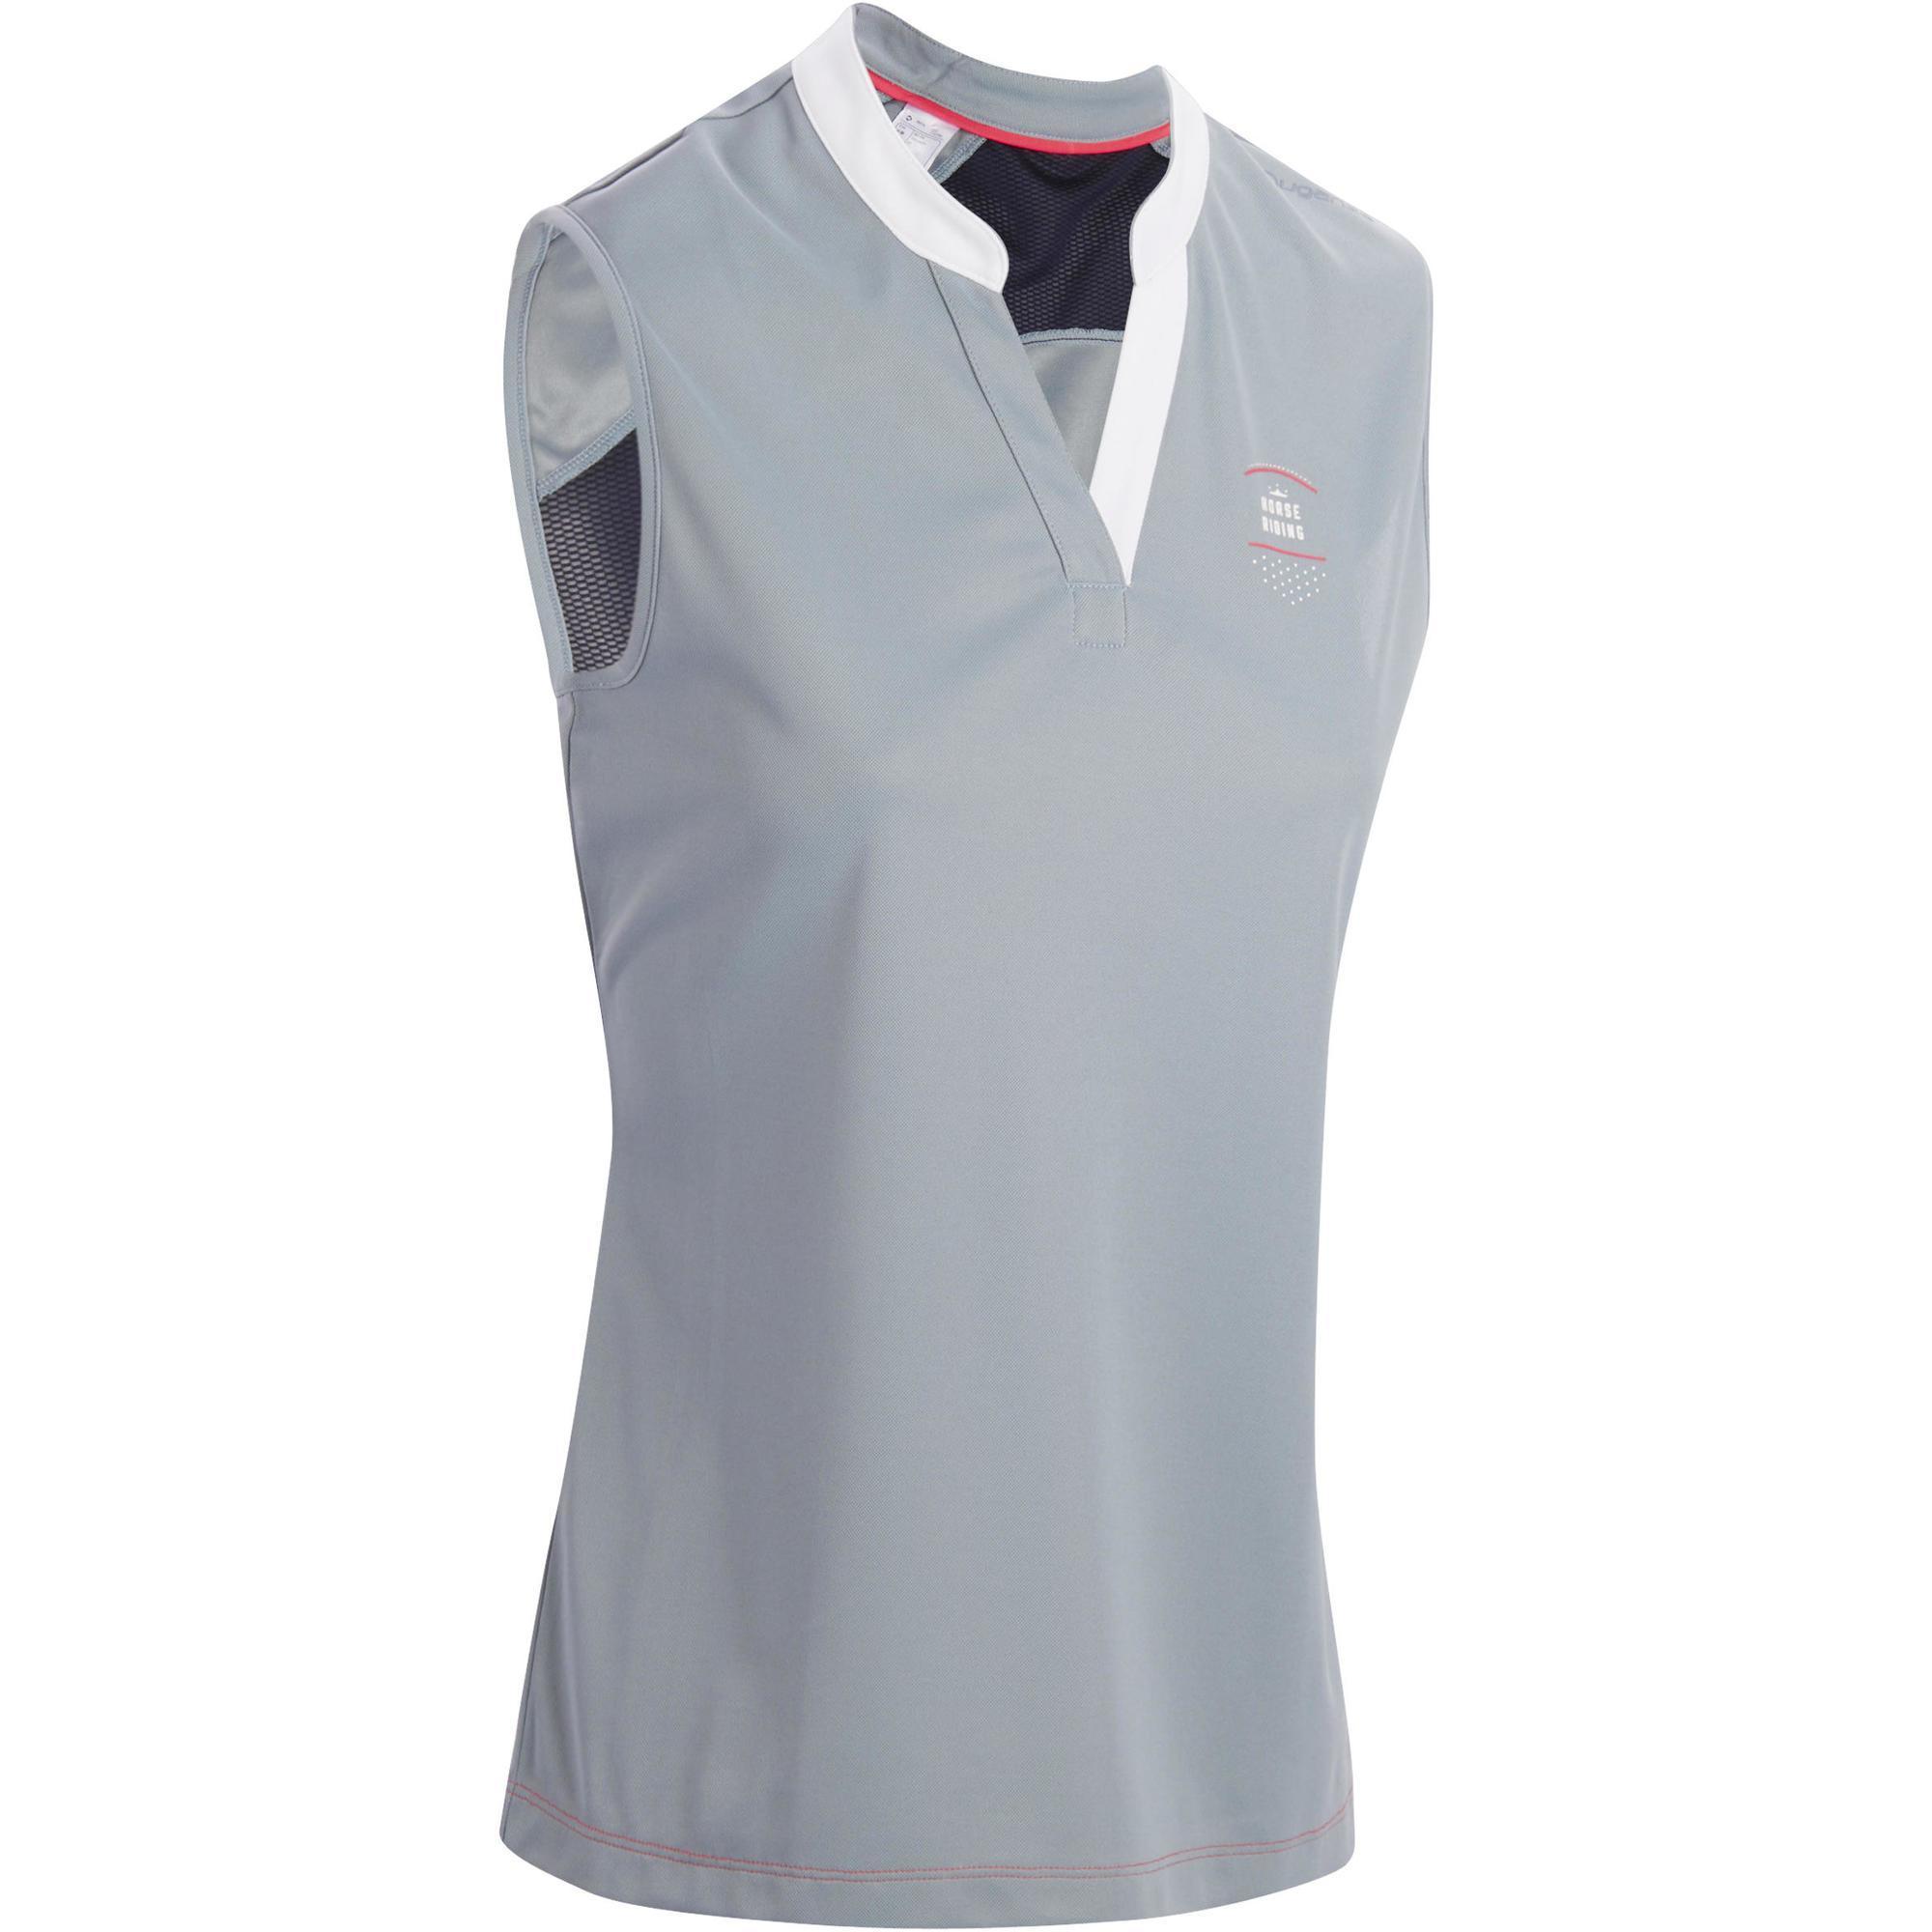 Fouganza Mouwloos damesshirt ruitersport DEB500 mesh grijs/marineblauw